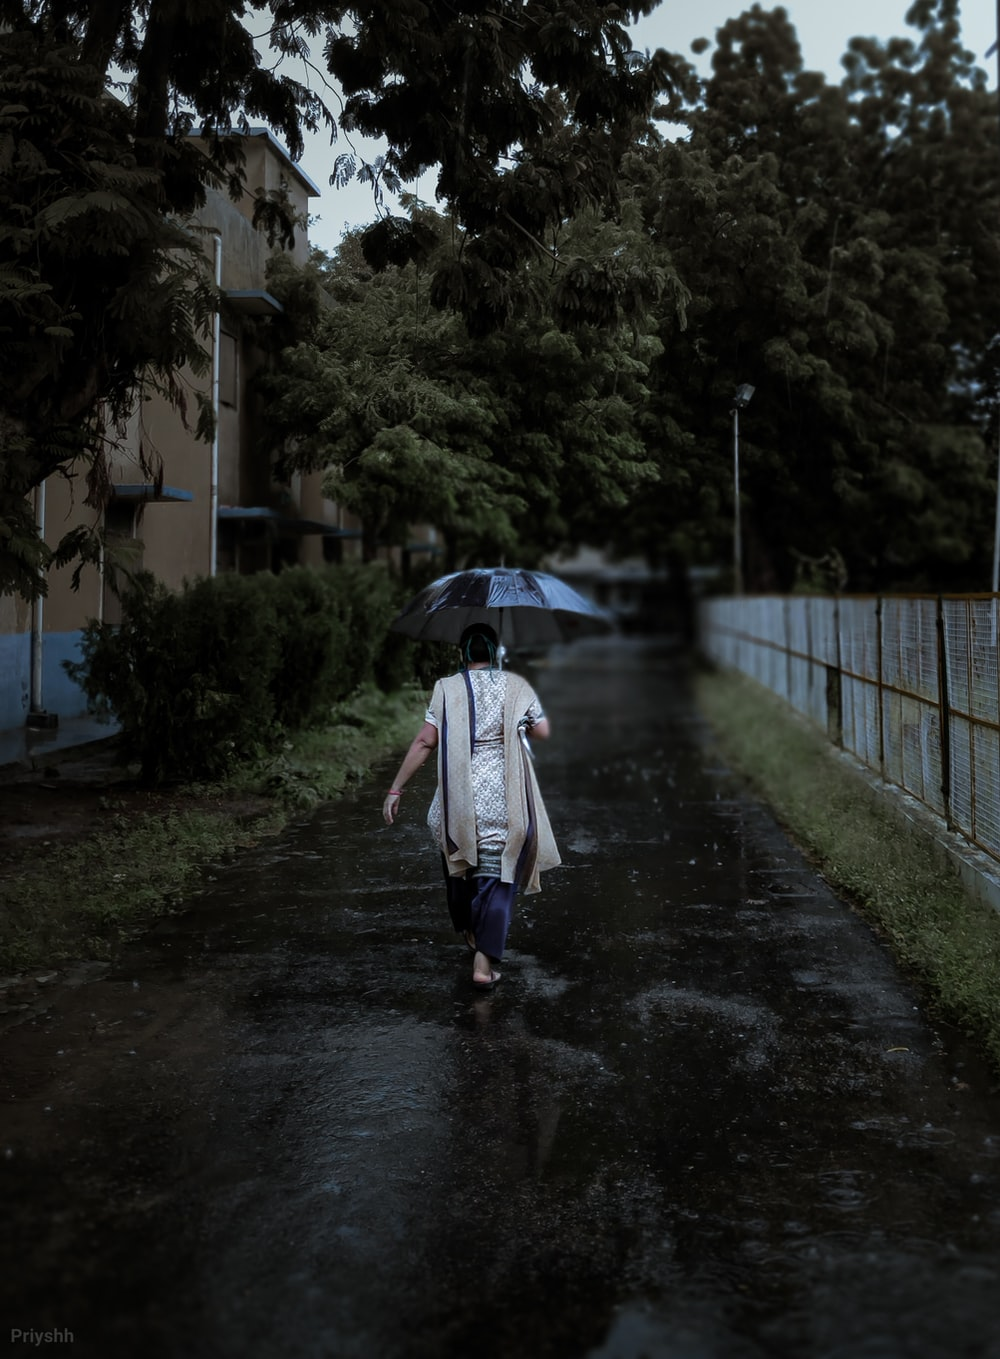 woman in white coat walking on pathway